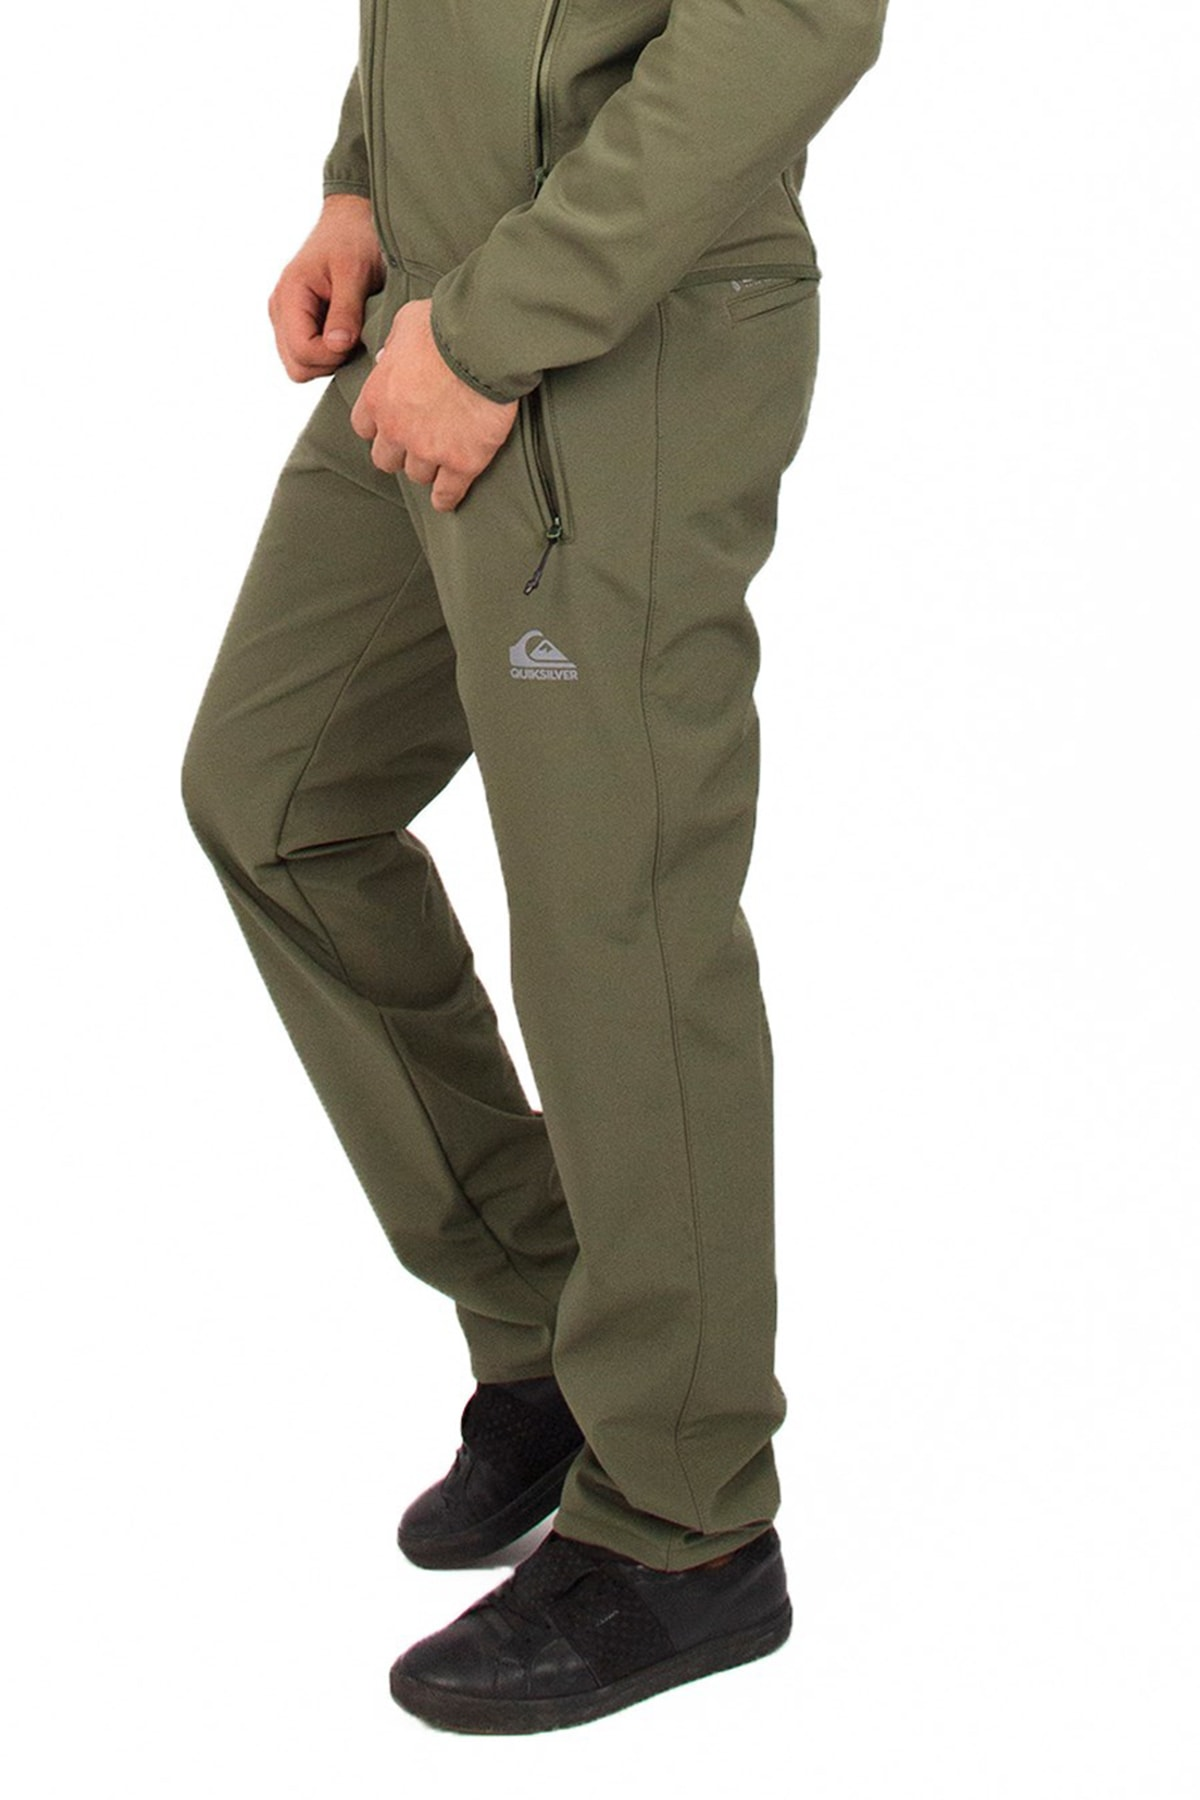 Quiksilver Erkek Pantolon - OD Softshell - EQYNP03712T 2